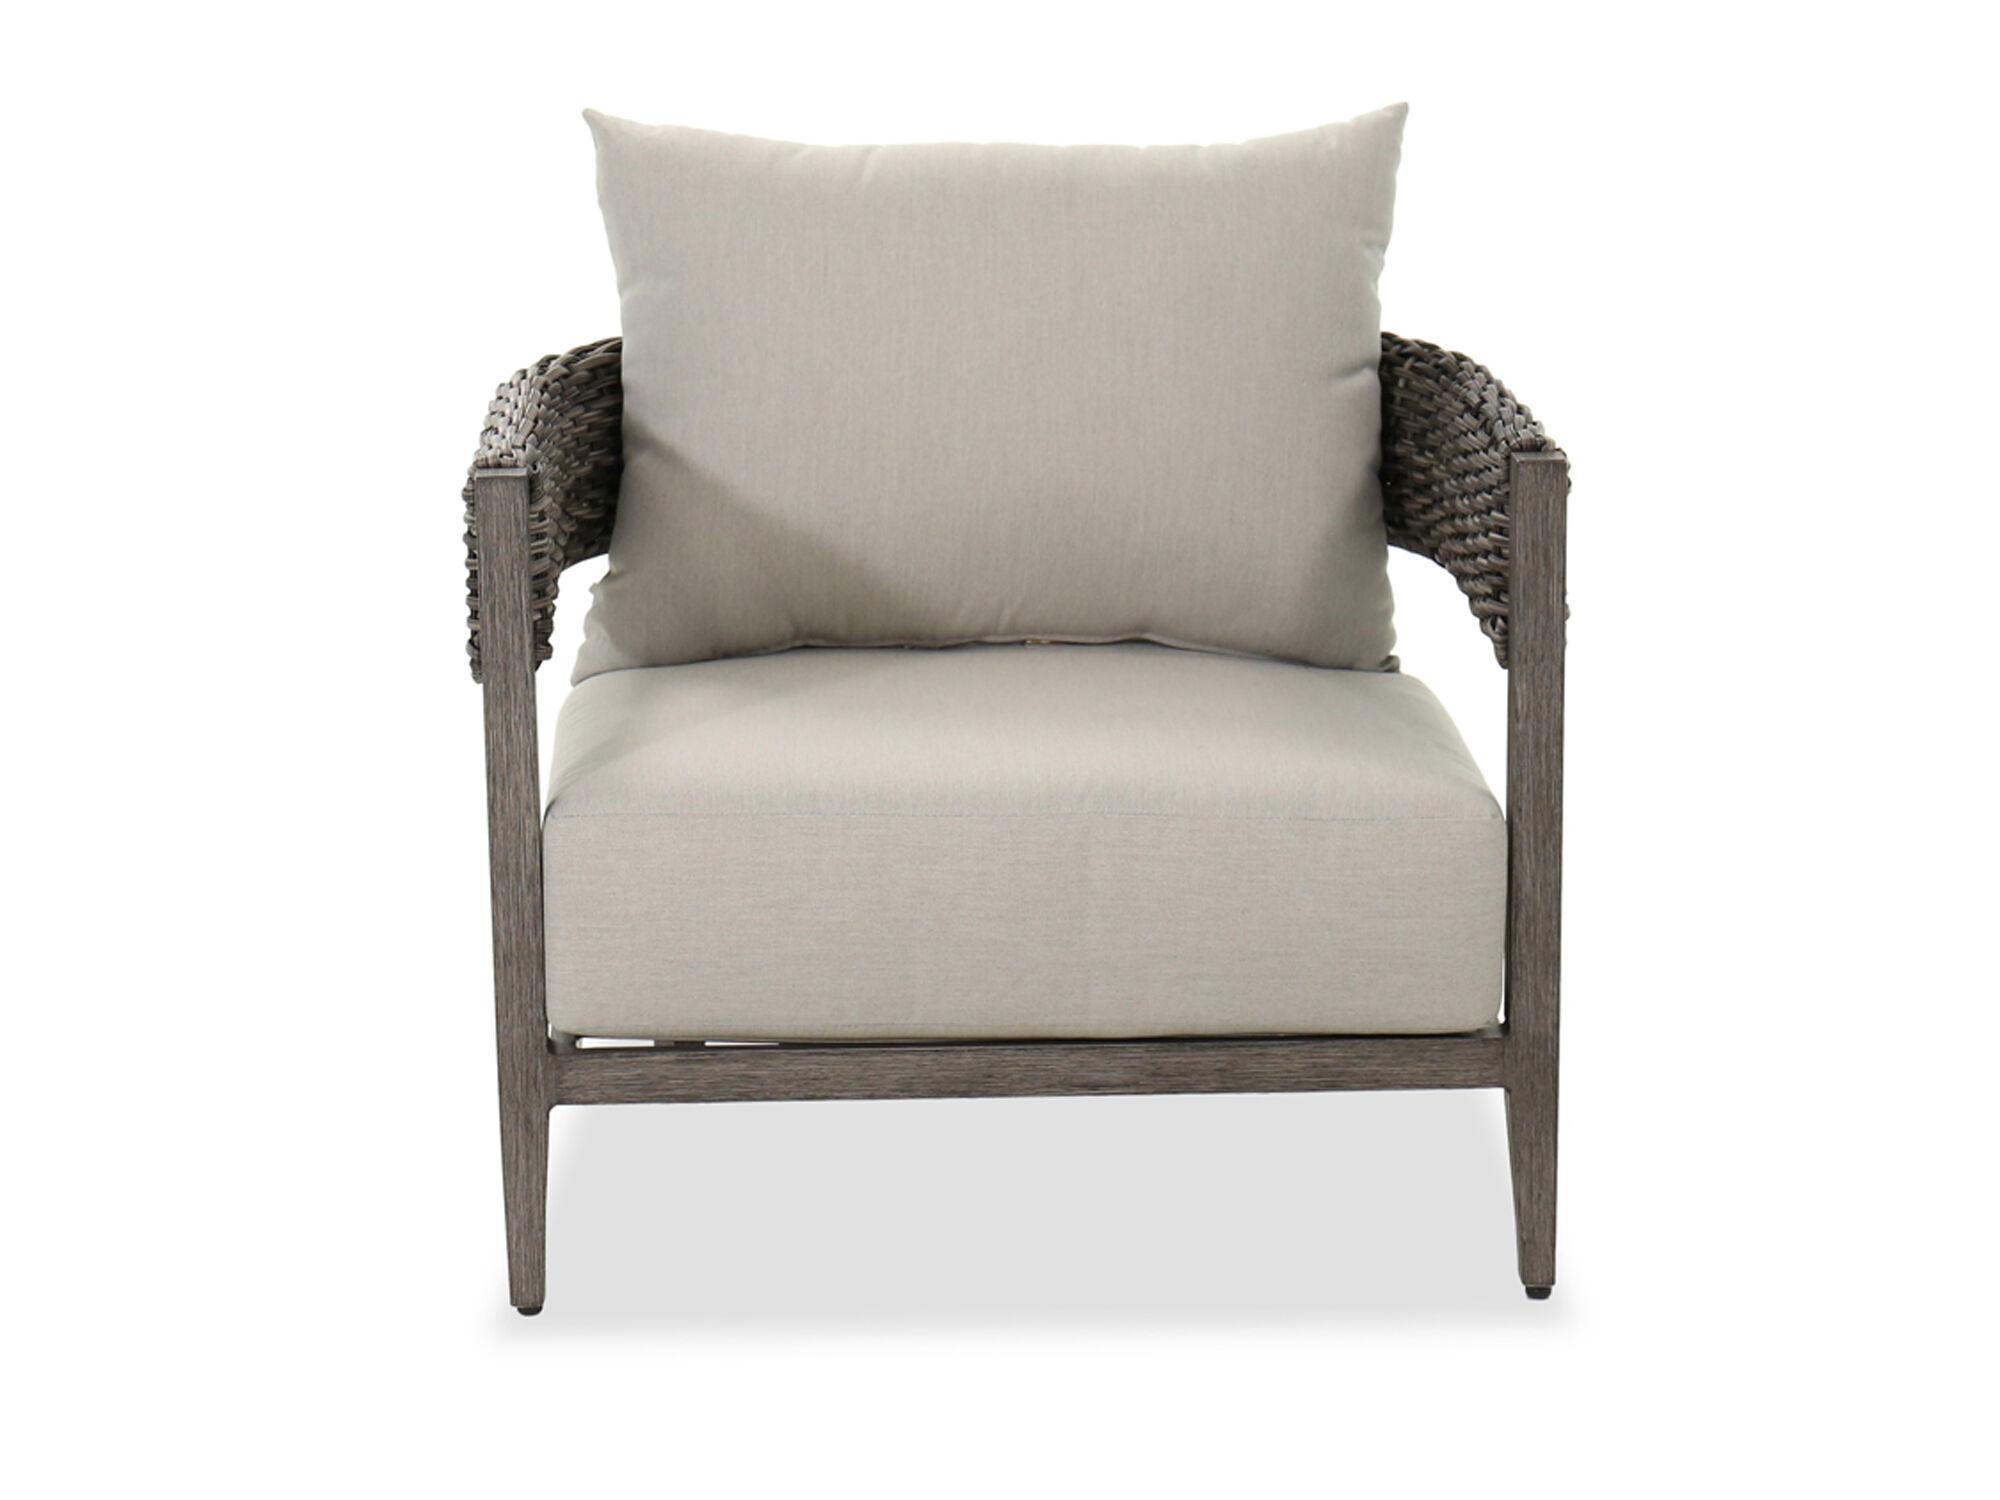 aluminum patio club chair in gray